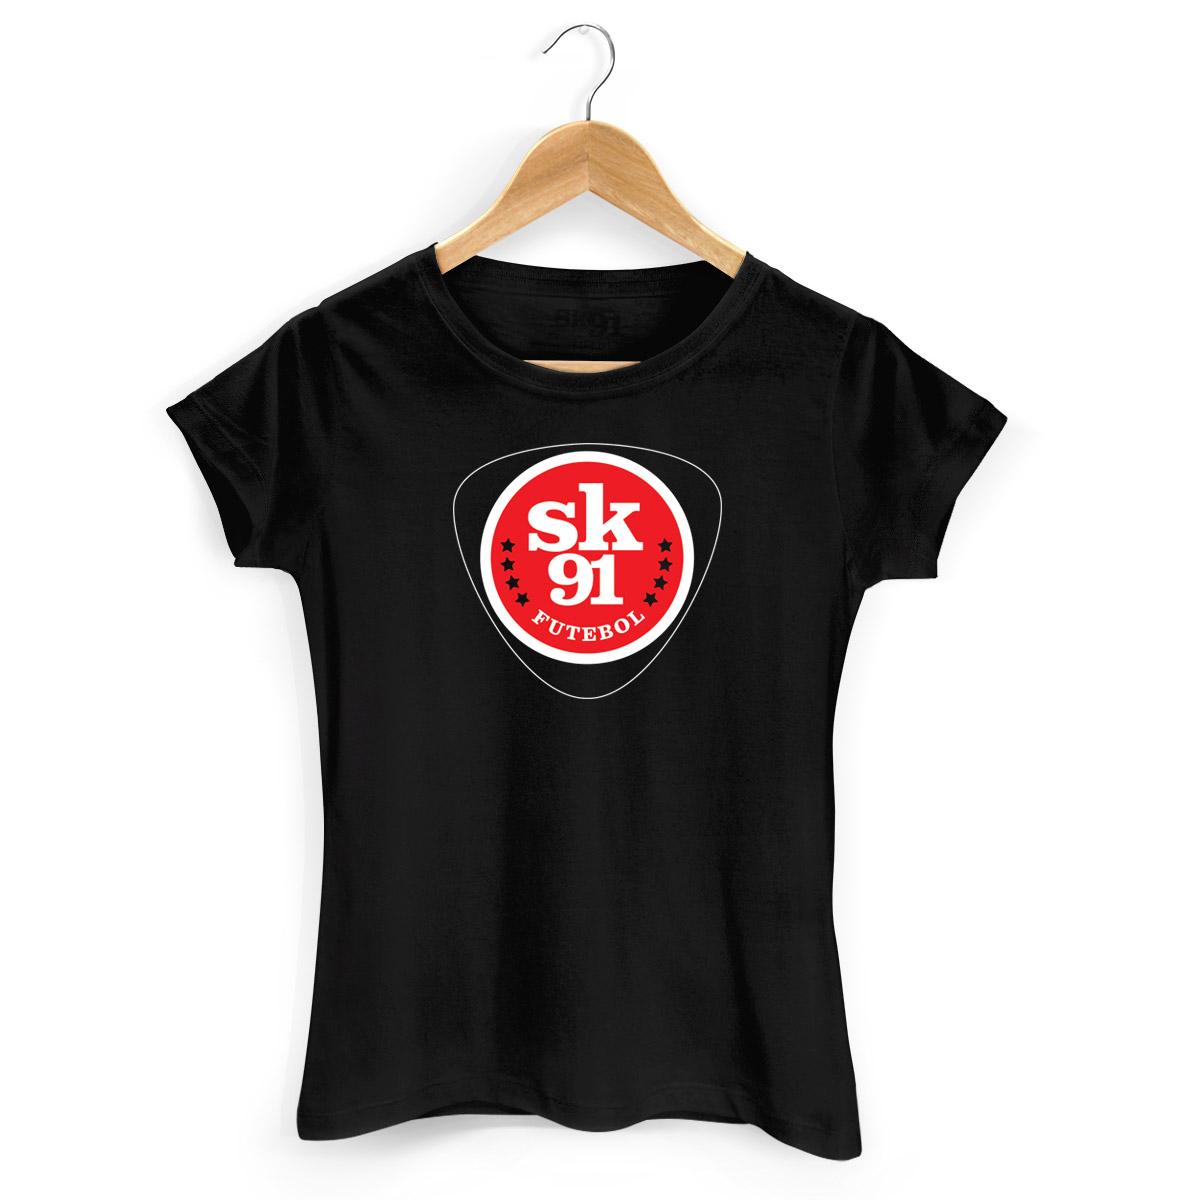 Camiseta Feminina Skank Sk91 Futebol